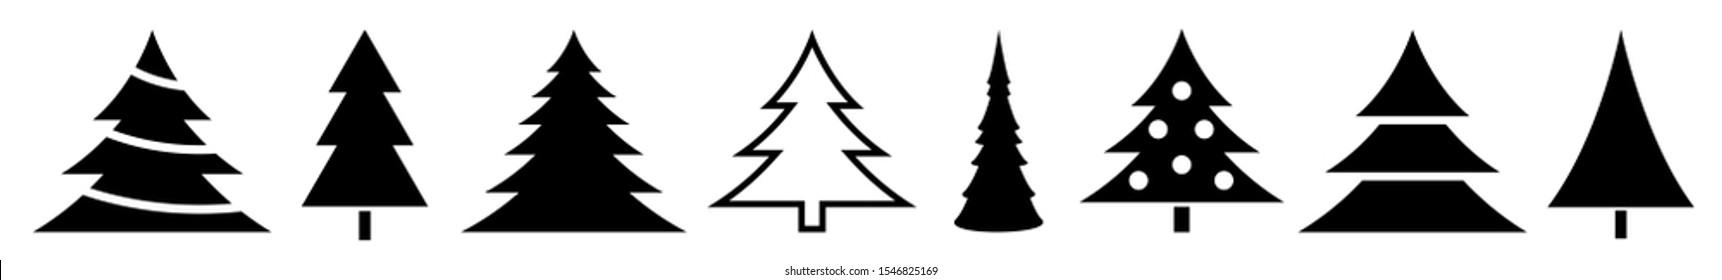 Christmas Tree Black Icon Fir Tree Adornment Illustration x-mas Symbol Logo Isolated Variations